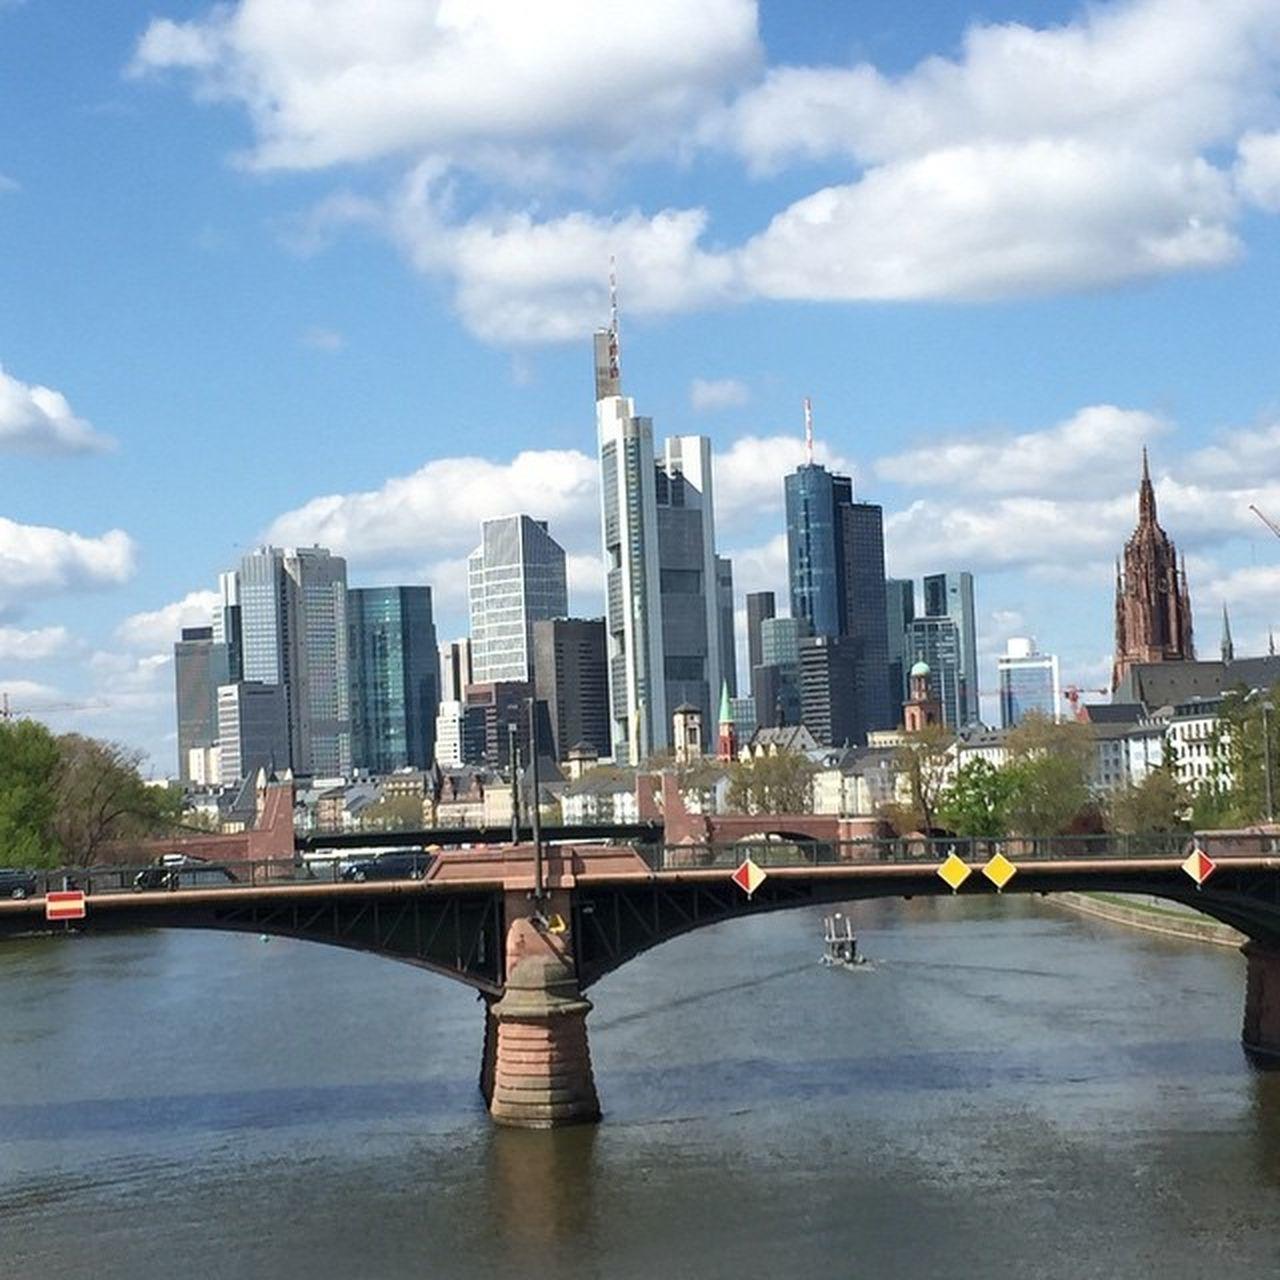 Skyline 2015 Skyline_2015 Frankfurt Frakfurtcity Frankfurt_de Frankfurt_art Frankfurtlovers Frankfurtmylove Main Germany